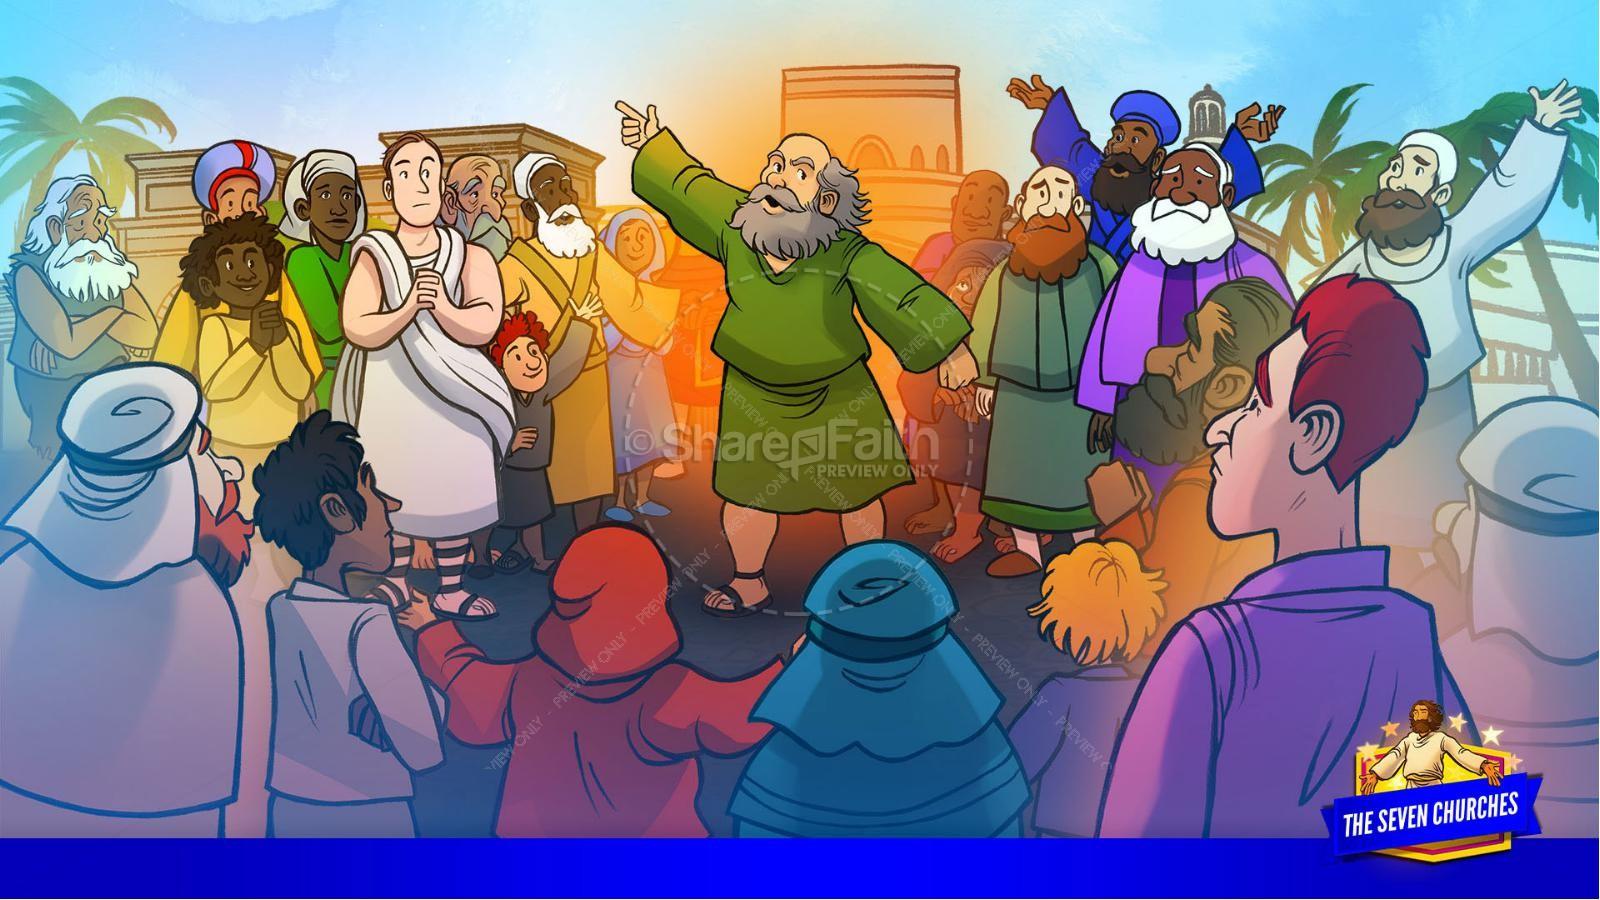 Revelation 2 3 The Seven Churches Kids Bible Story   slide 11